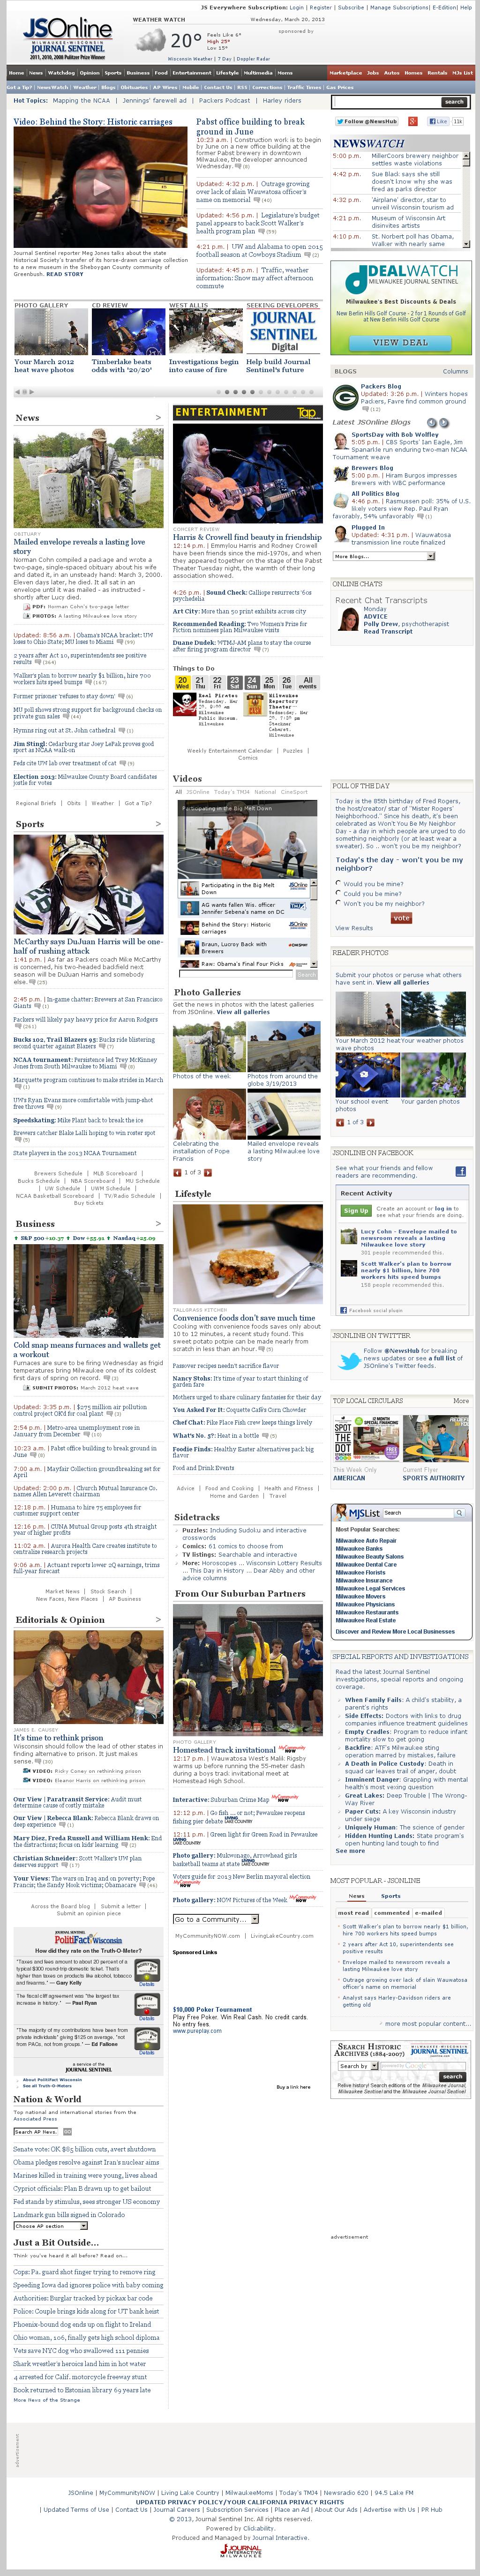 Milwaukee Journal Sentinel at Wednesday March 20, 2013, 10:14 p.m. UTC